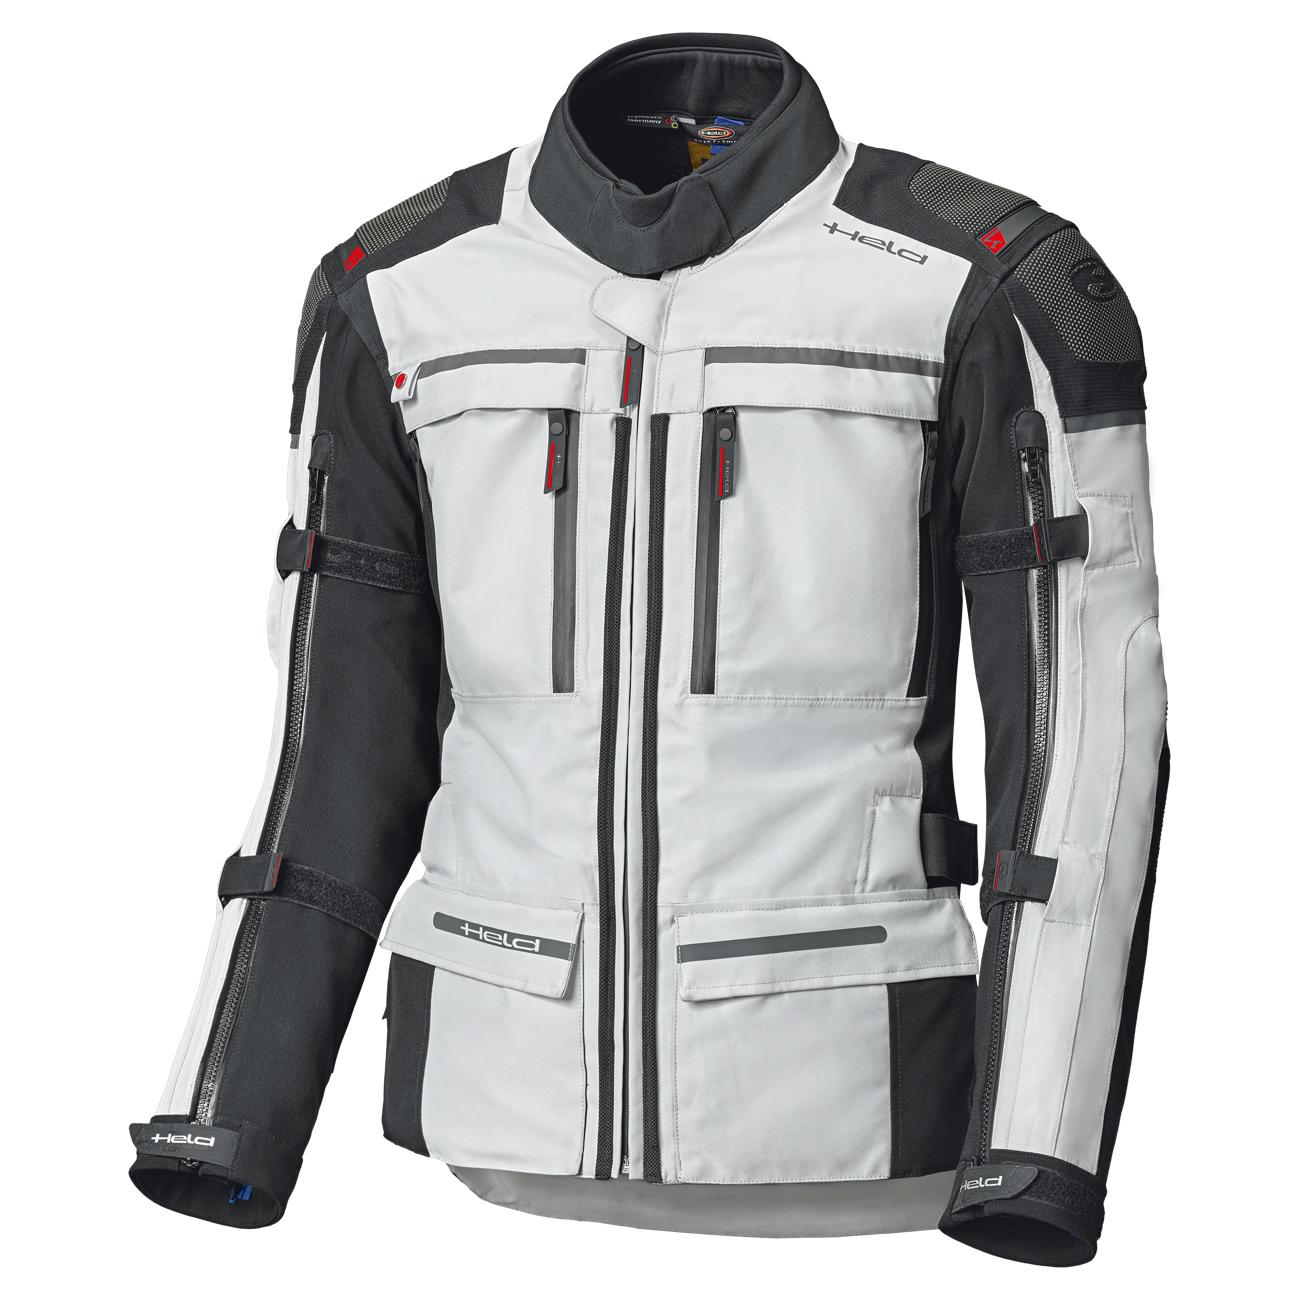 Held Atacama Top Gore-Tex Veste De Moto Textile Gris Rouge XL